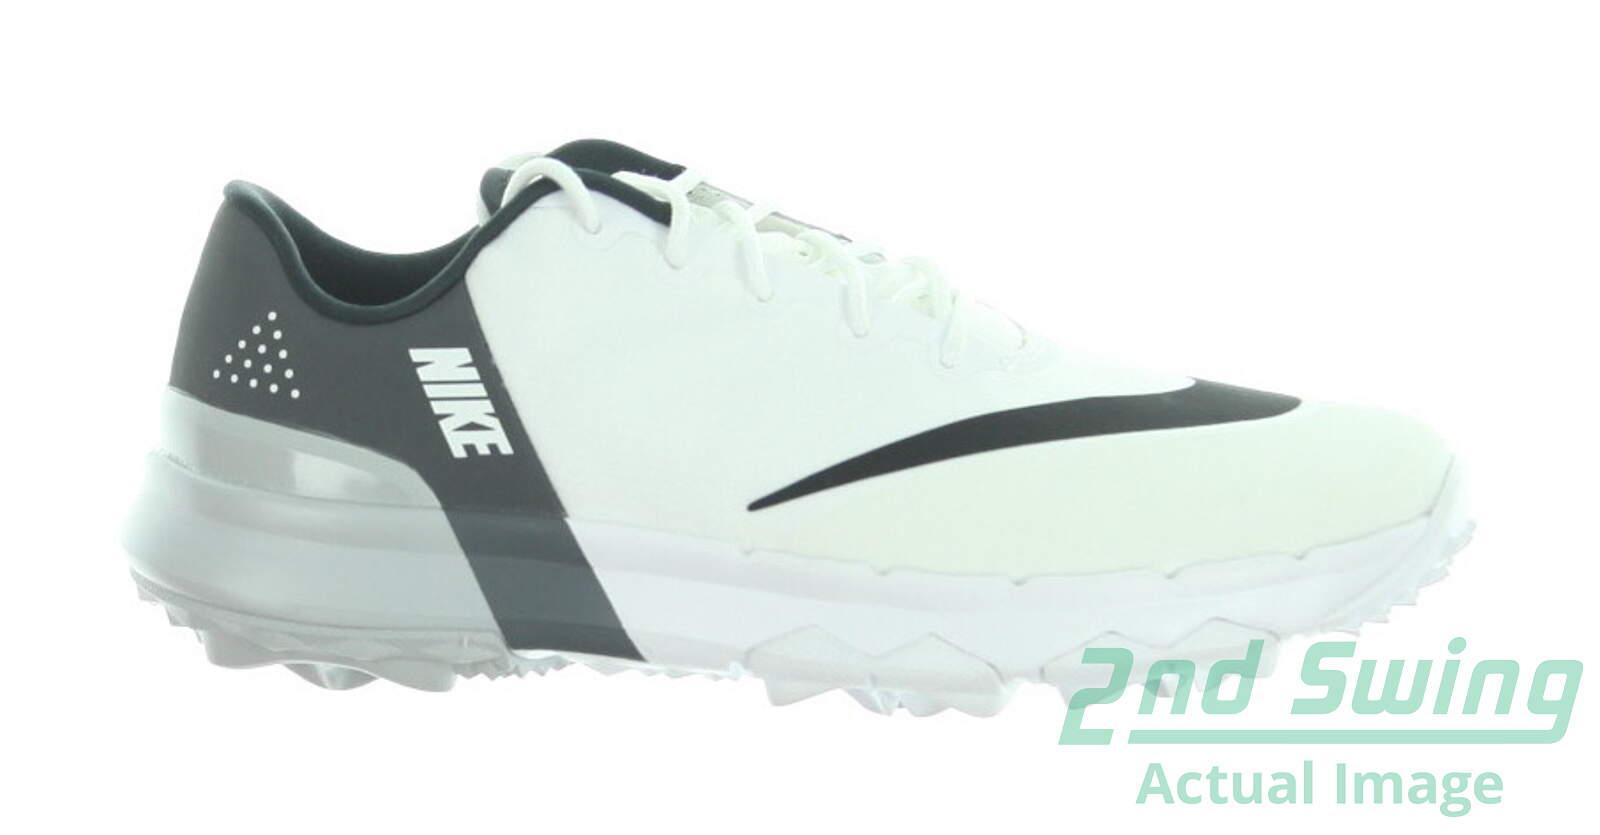 7bad4ace8e33 New Womens Golf Shoe Nike FI Flex 8.5 White Black MSRP  100 - Golf Footwear